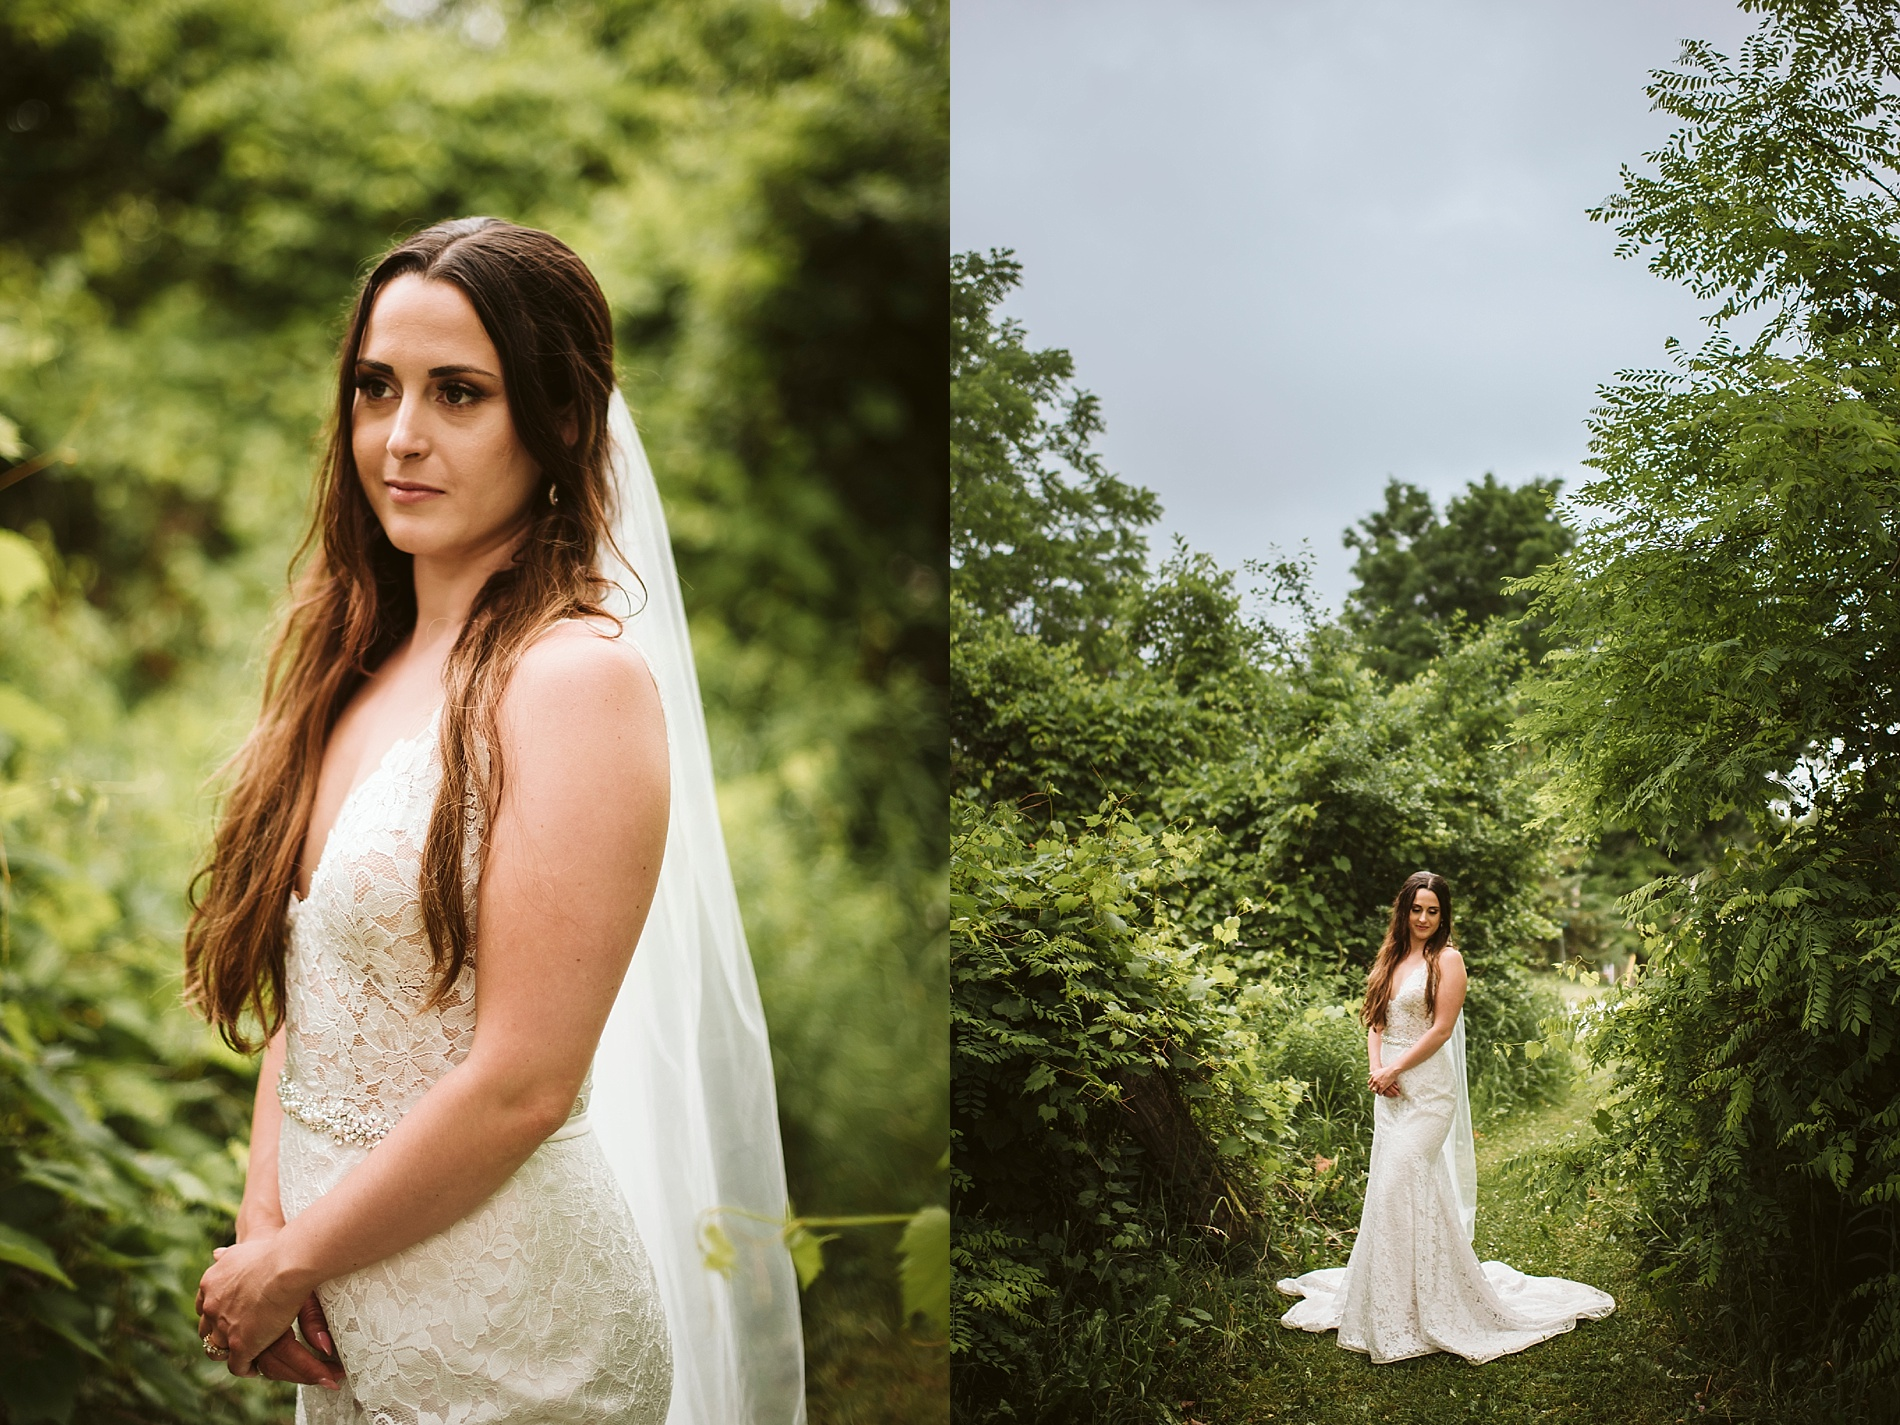 Kawartha_Lakes_Wedding_Bobcageon_Eganridge_Resort_Toronto_Photographer_0062.jpg